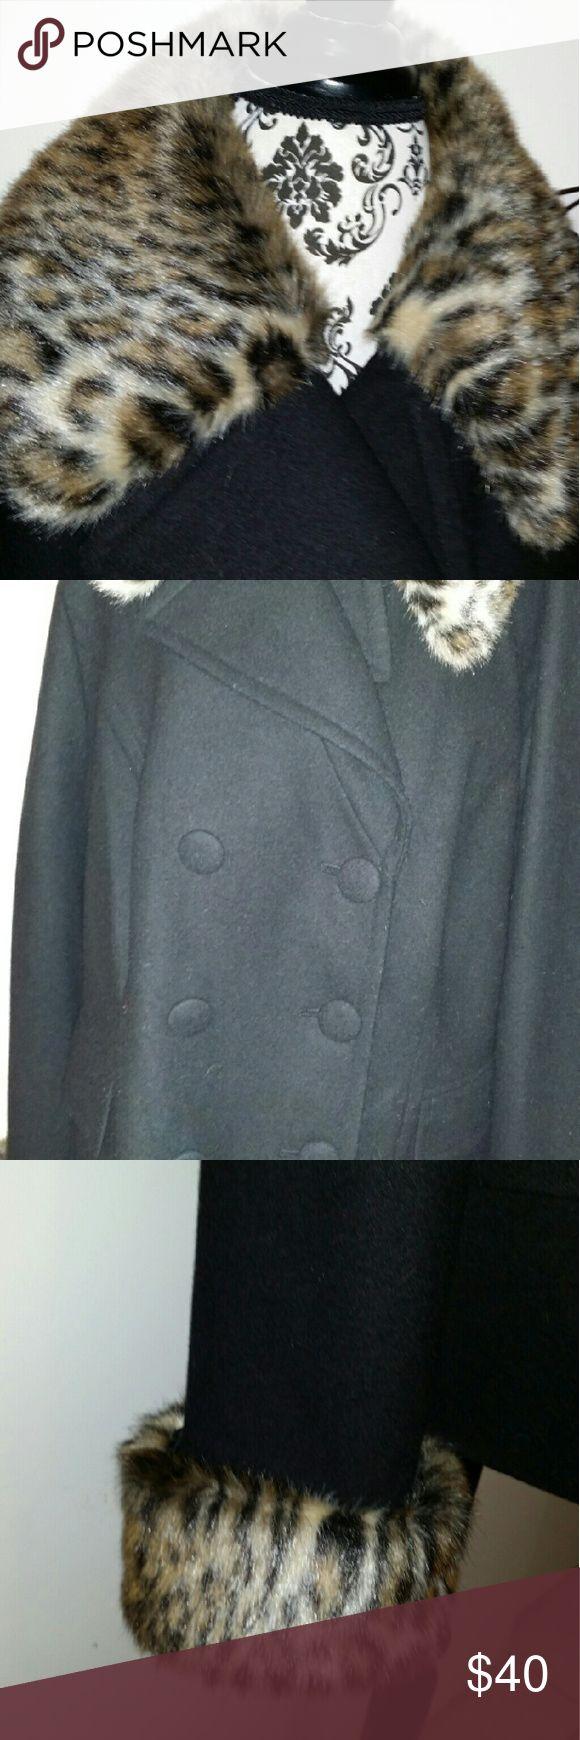 Plus size coat Plus size peacoat with leopard fur INC International Concepts Jackets & Coats Pea Coats